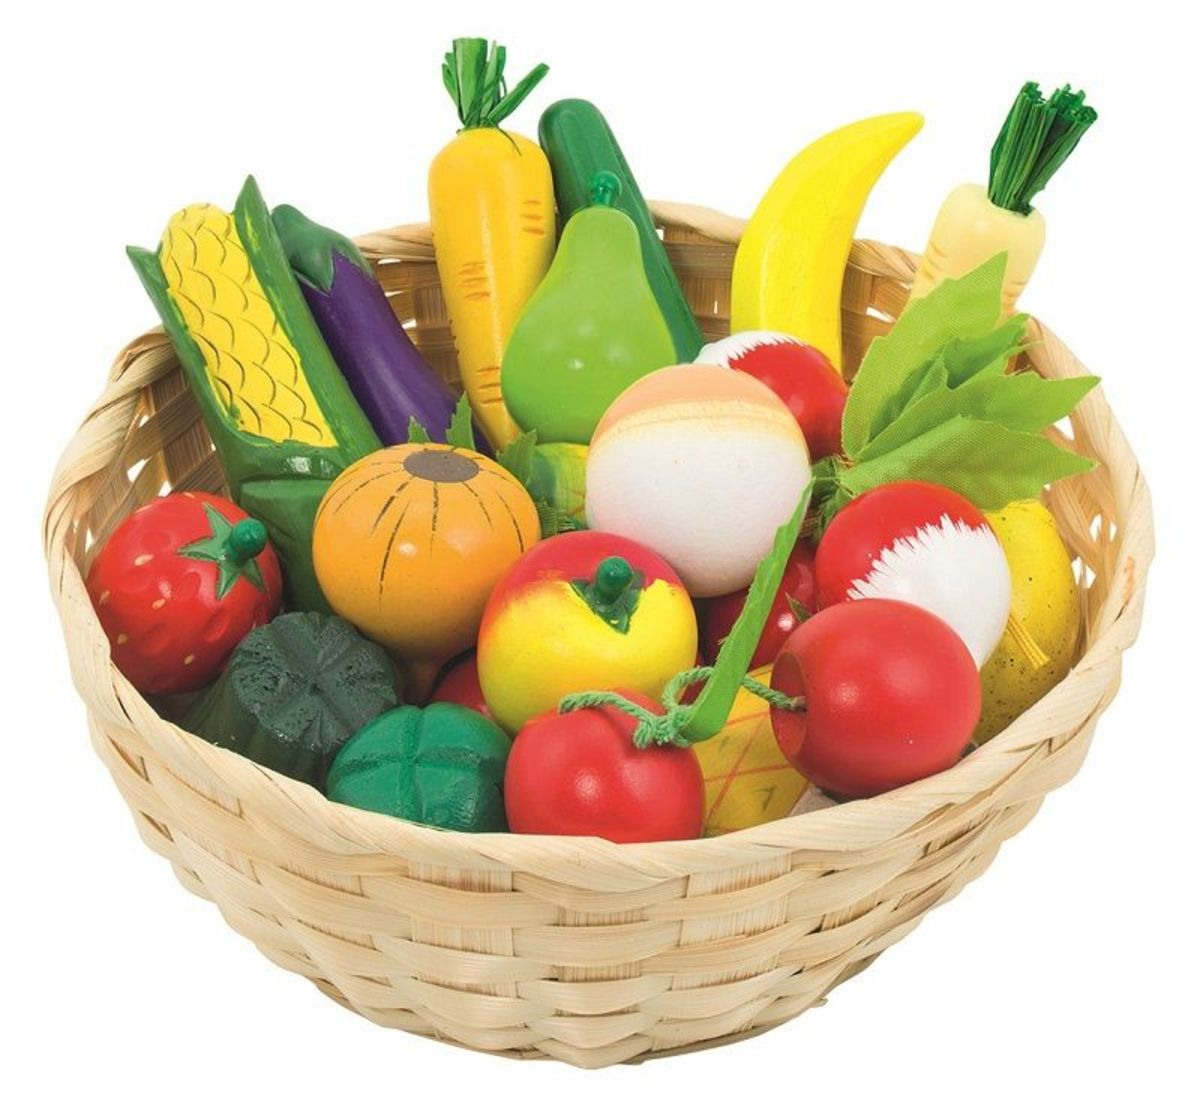 Drevené ovocie a zelenina v košíku 21 ks Vegetable basket